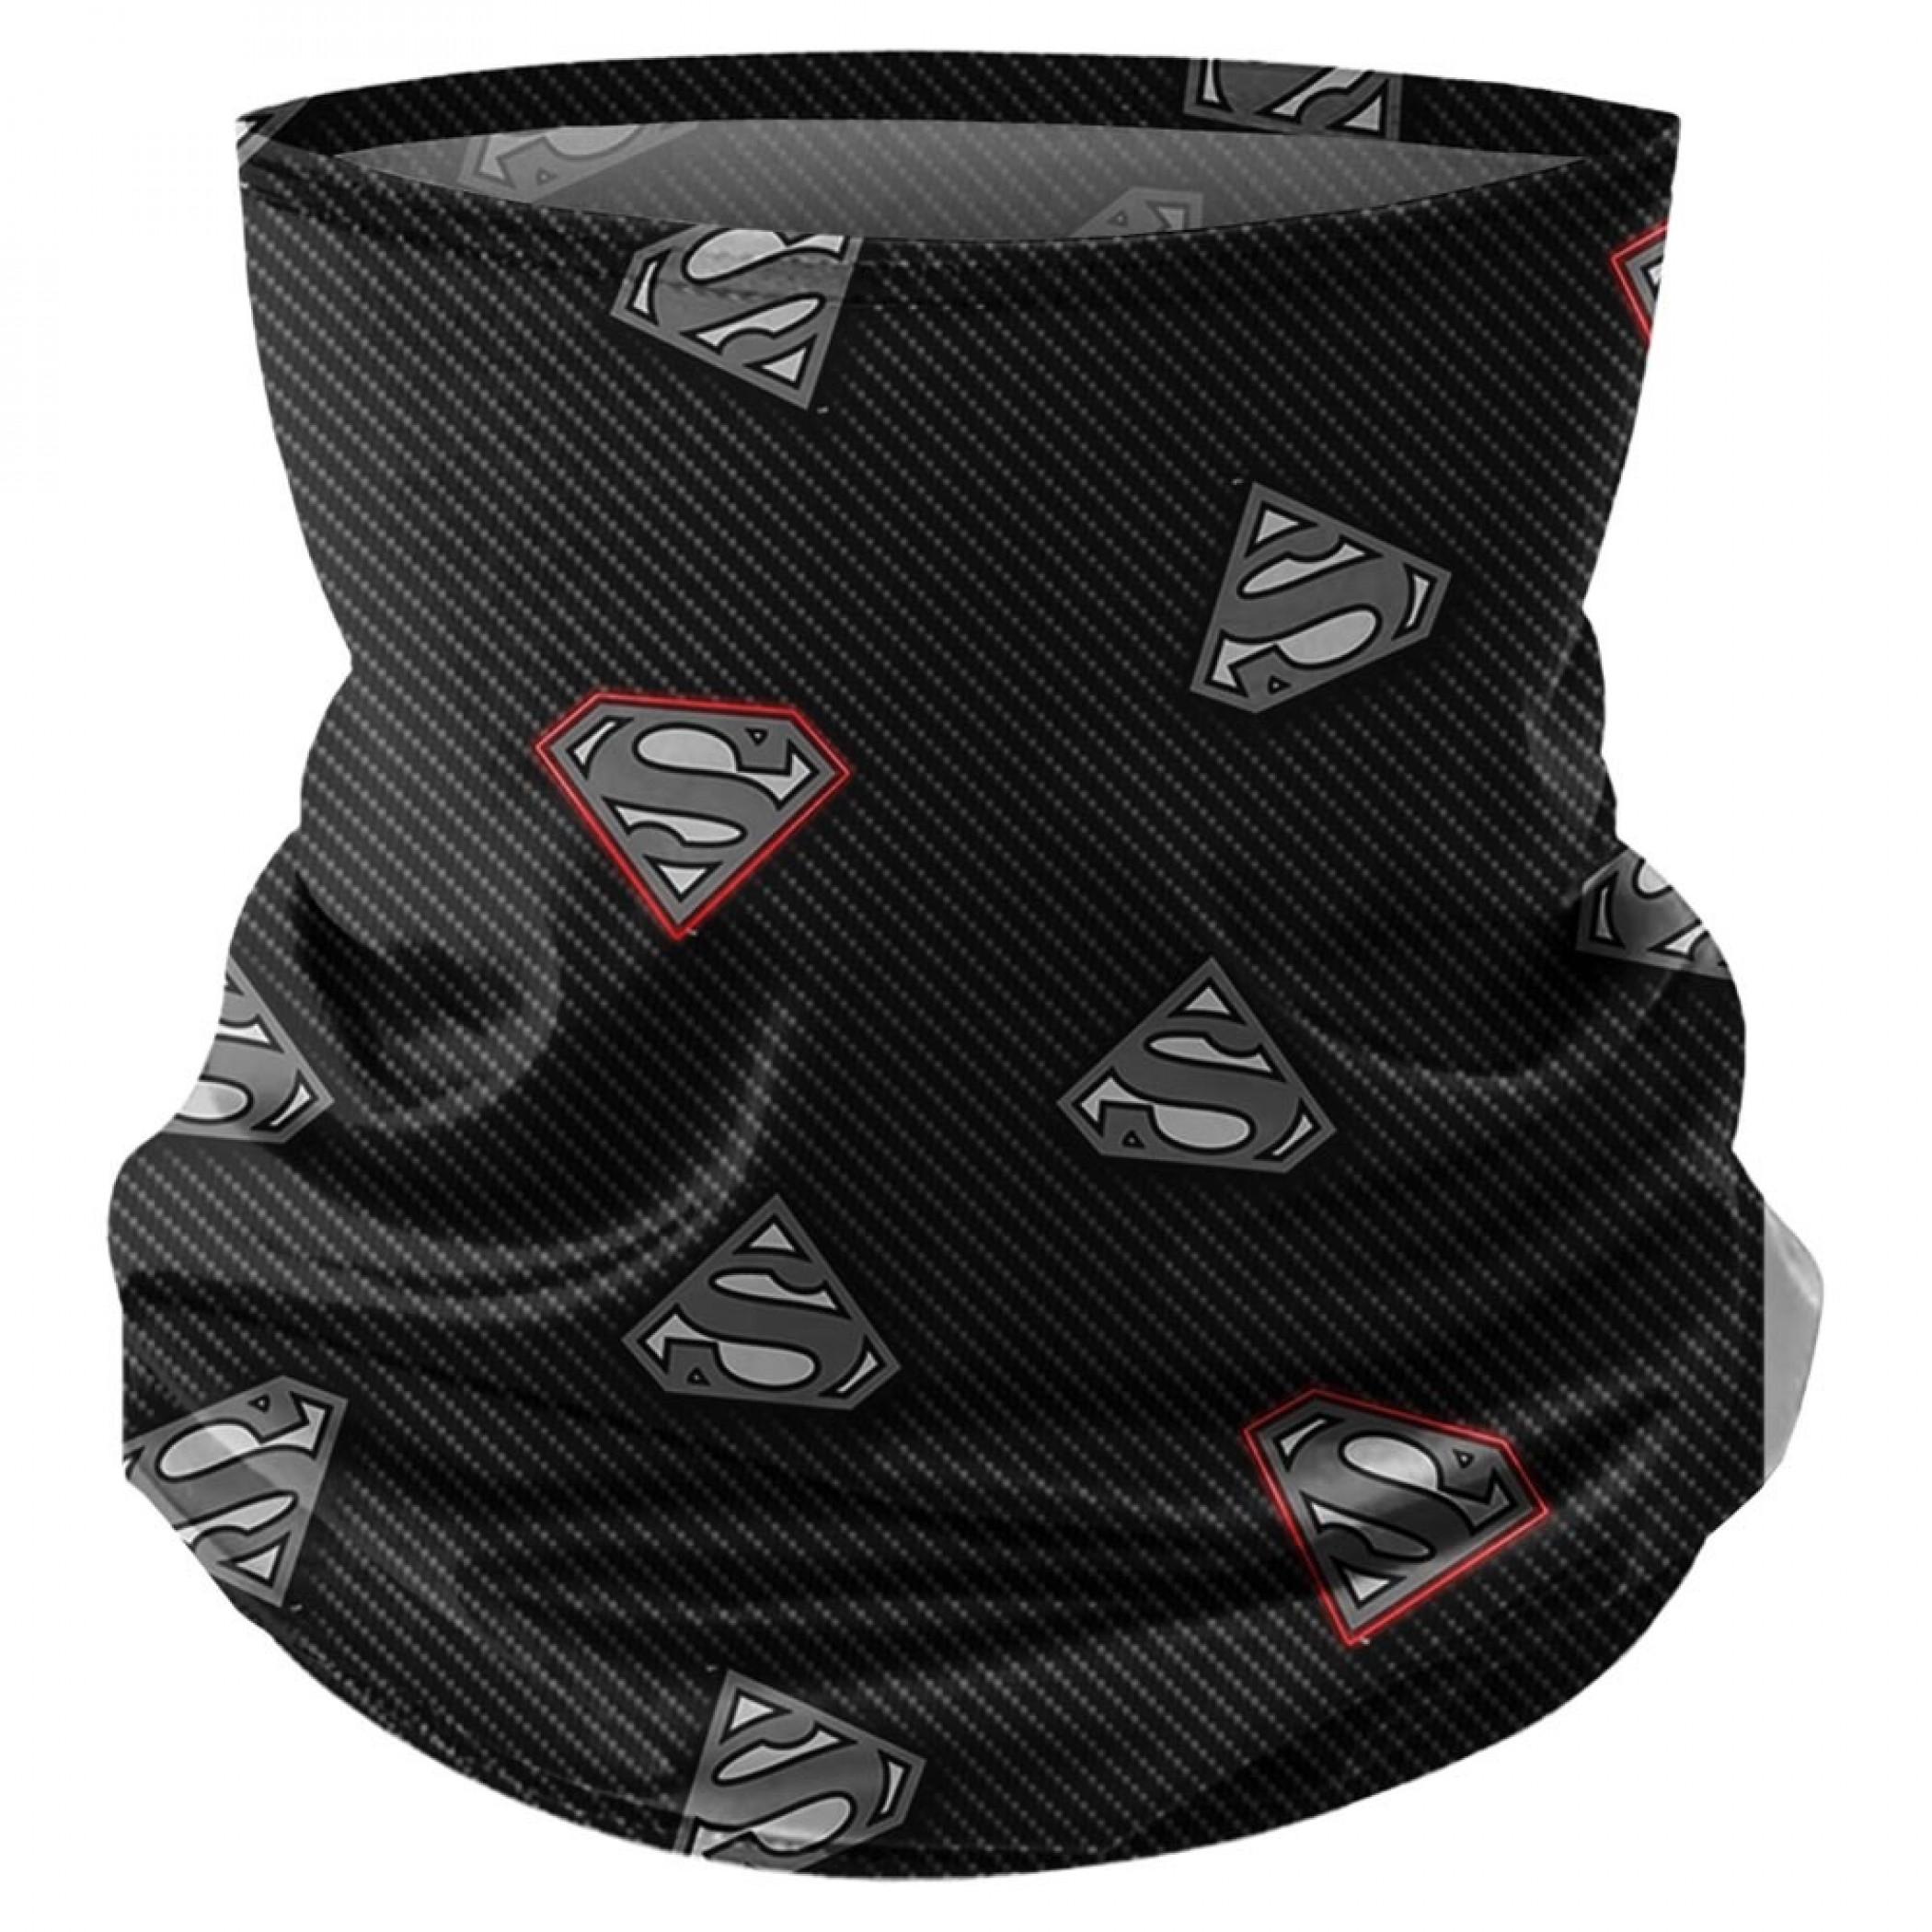 Superman Symbols All Over Print Full Face Mask Gaiter